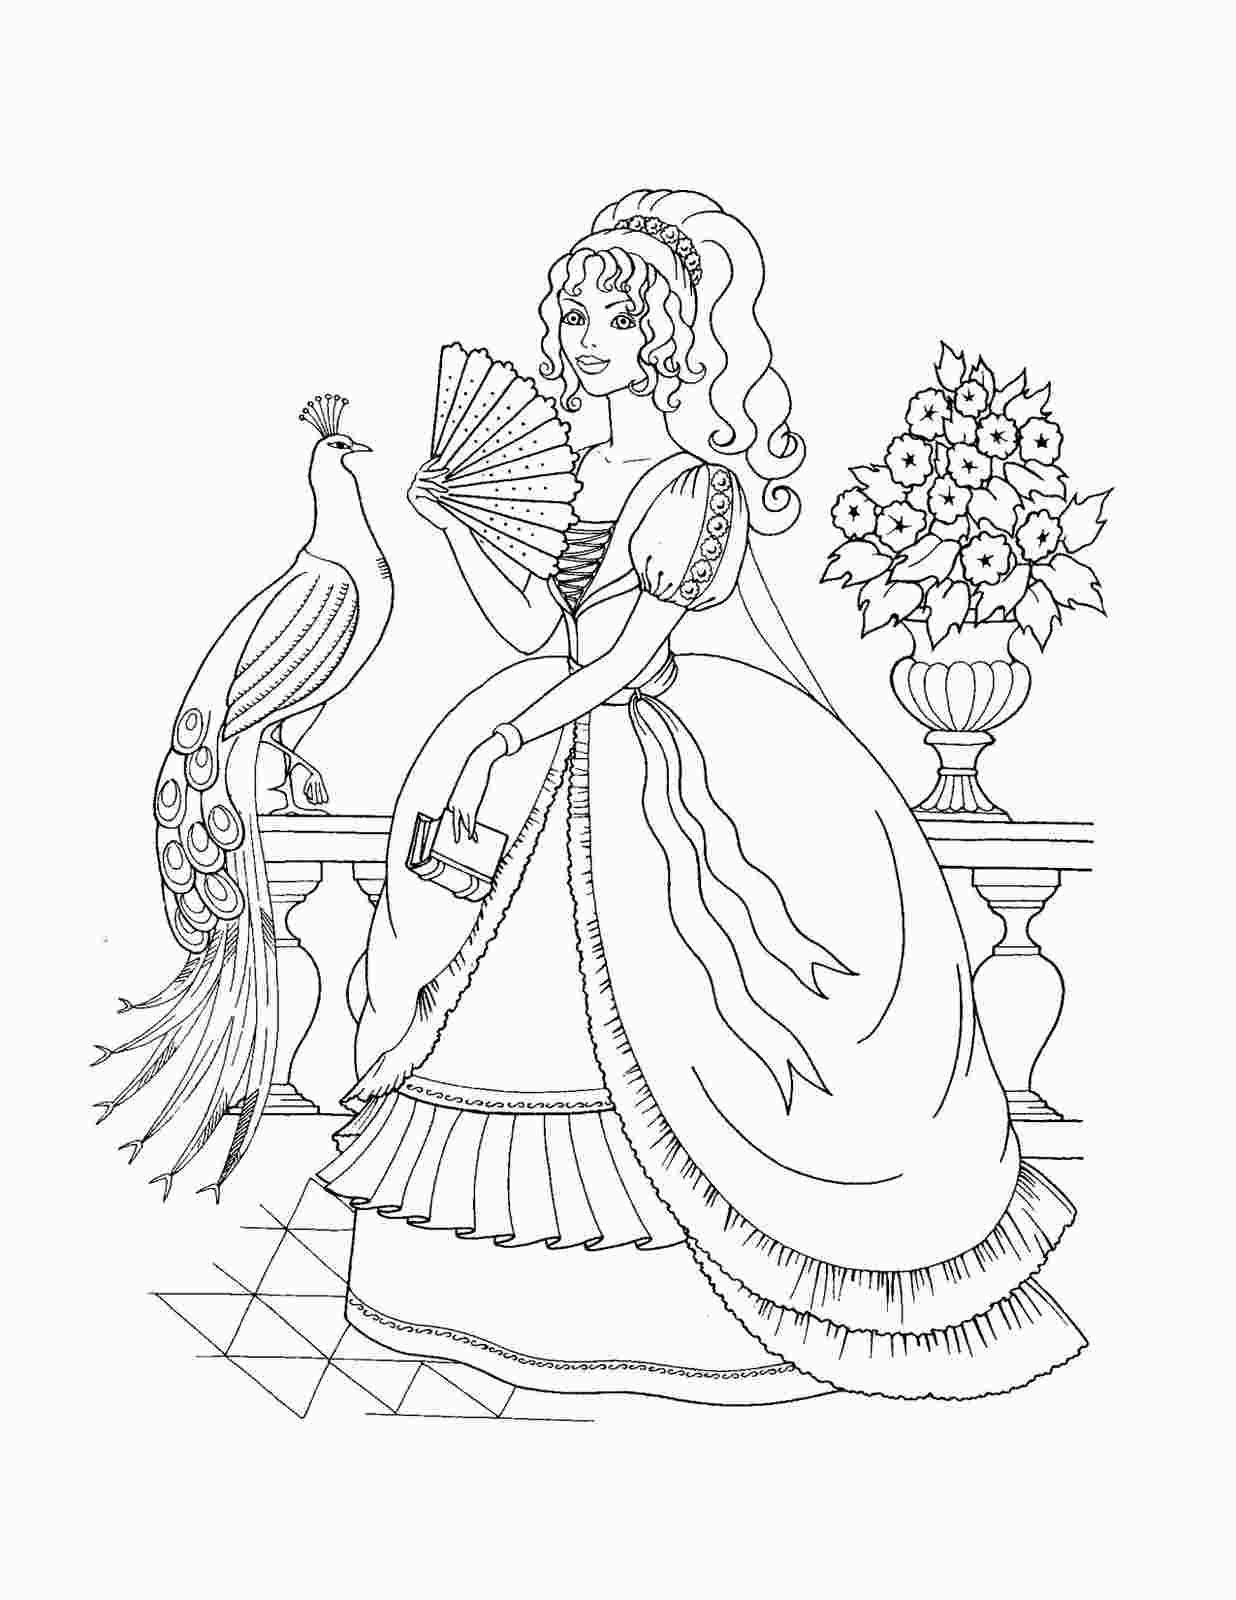 Non Disney Princess Coloring Pages Princess Coloring Pages